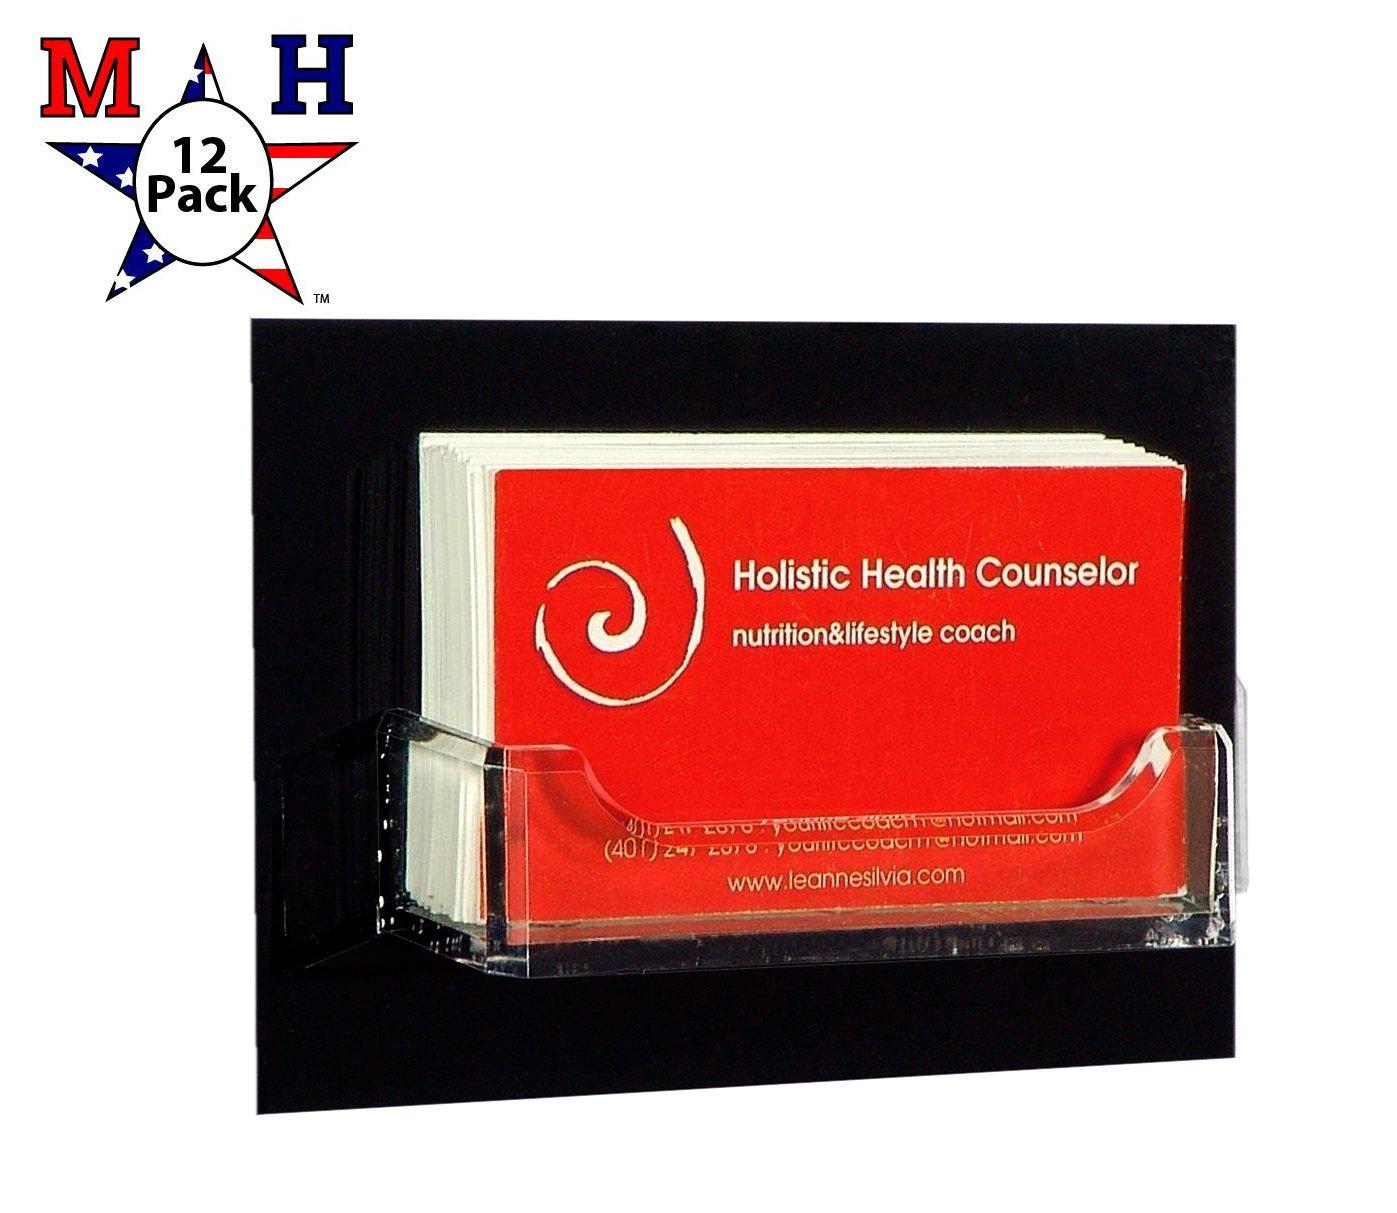 Marketing Holders Wall Business Card Holder Rack Display Premium Acrylic (12, Black Back Clear Pocket)